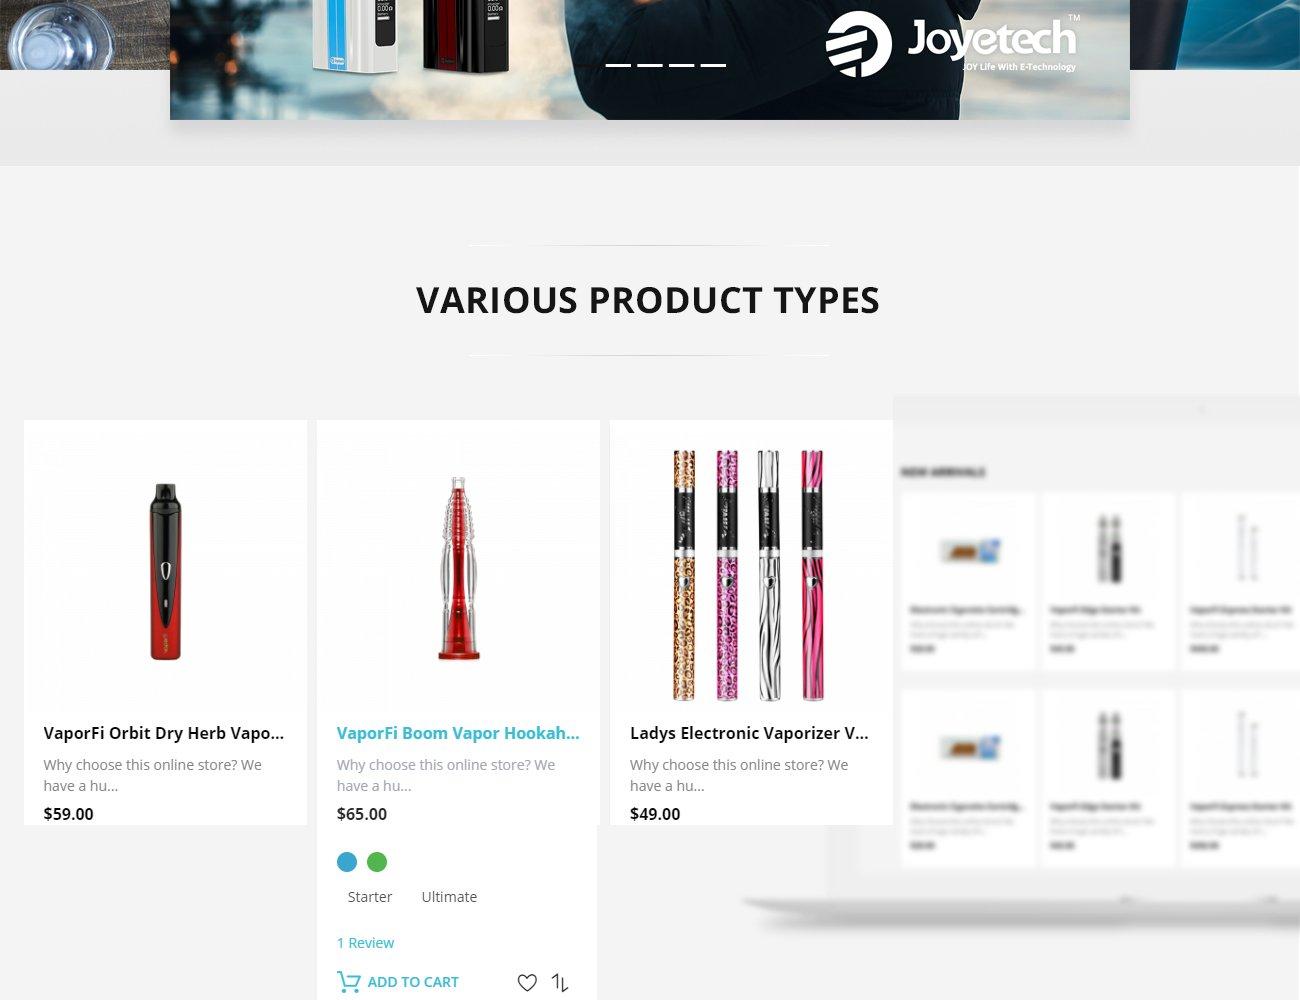 Vapor Electronic Cigarette Magento Store - Service invoices templates free online vape stores